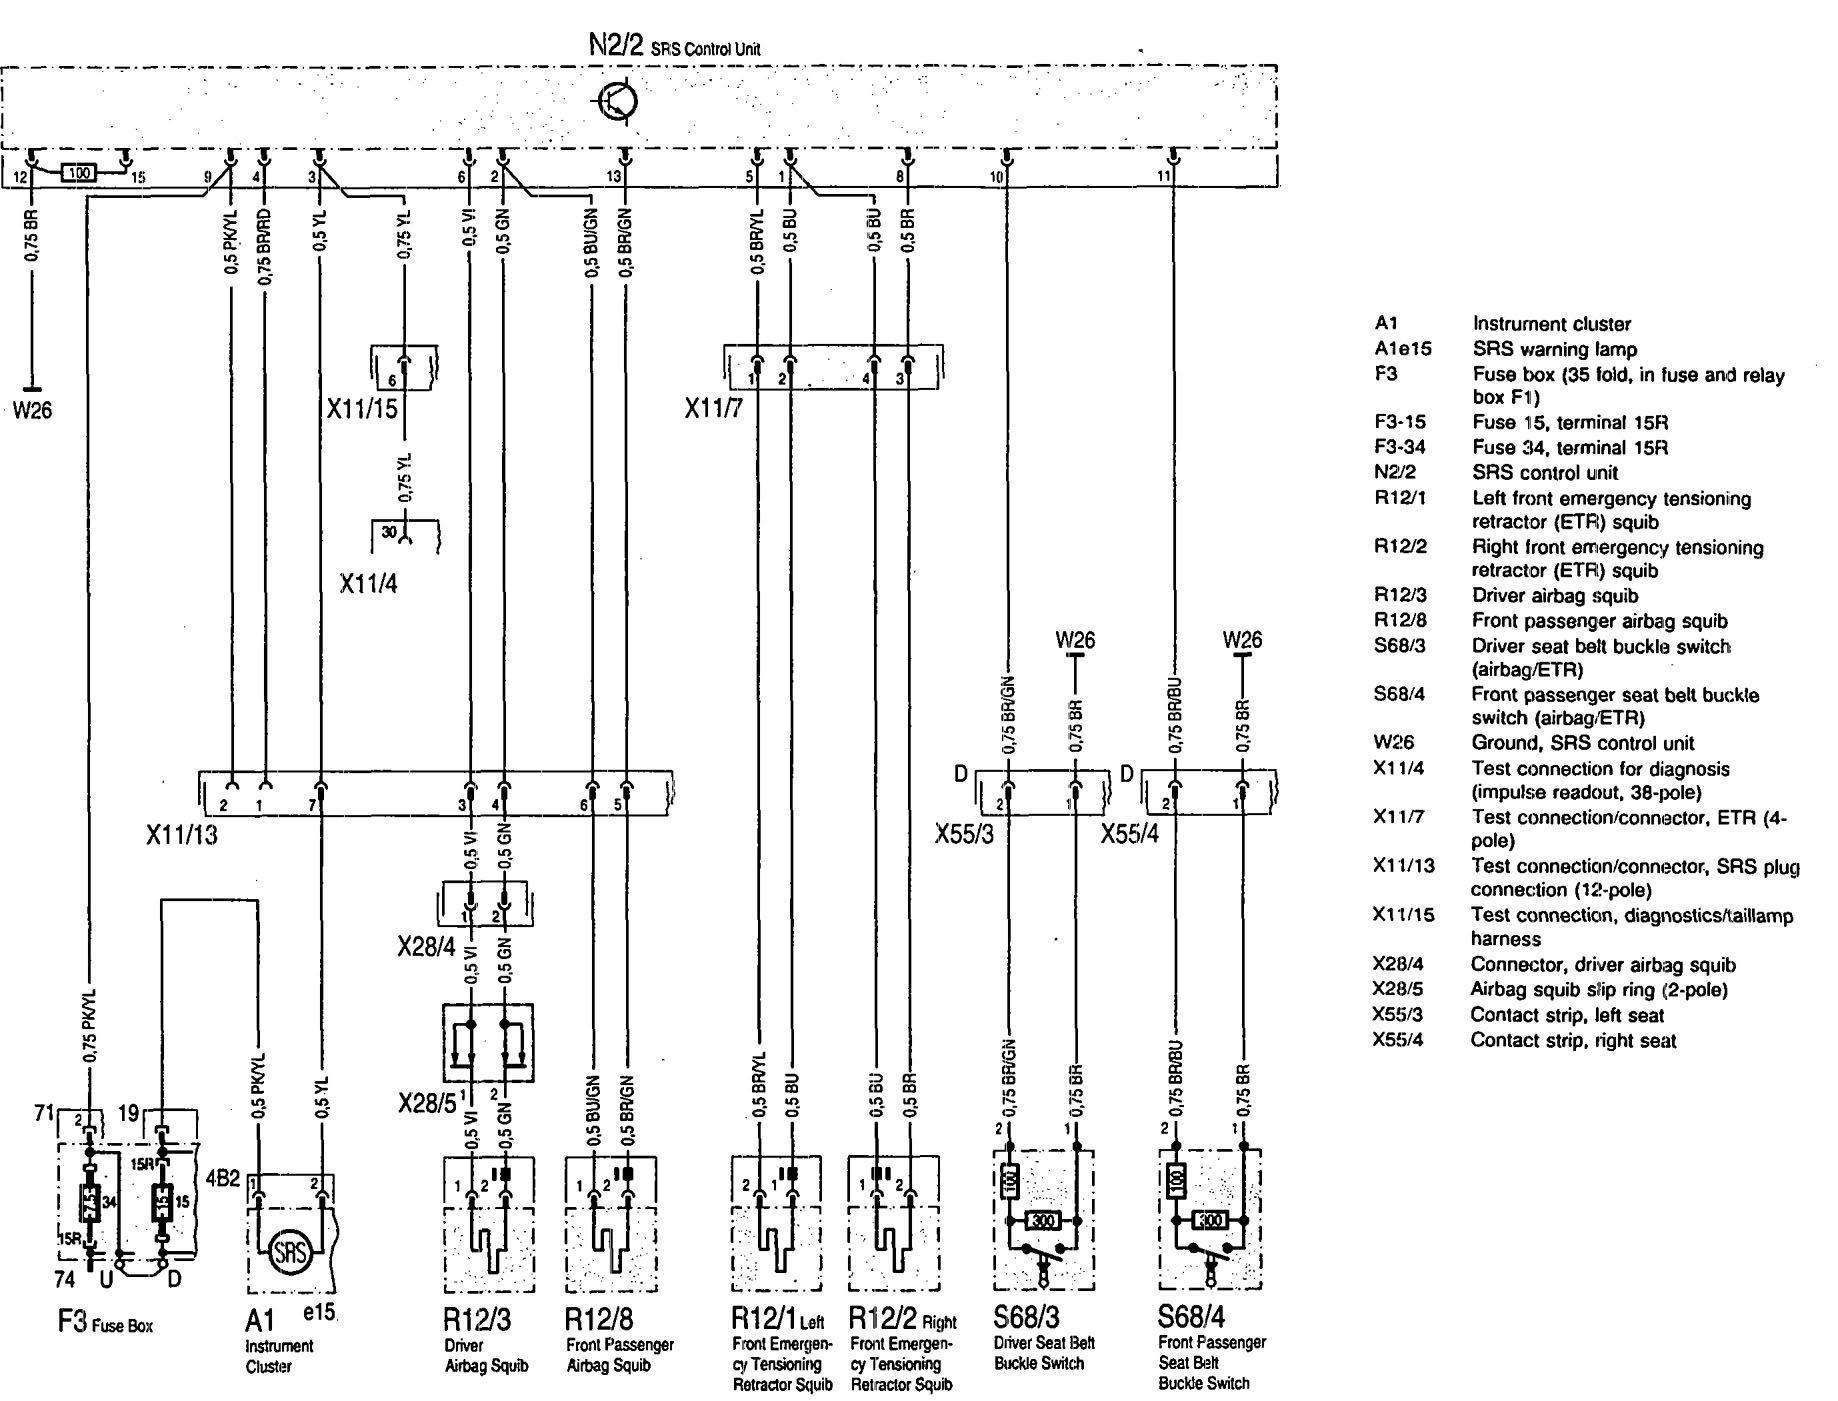 Diagram Mercedes Benz W204 Wiring Diagram Asm Full Version Hd Quality Diagram Asm Diagramsvalez Fattoriagarbole It